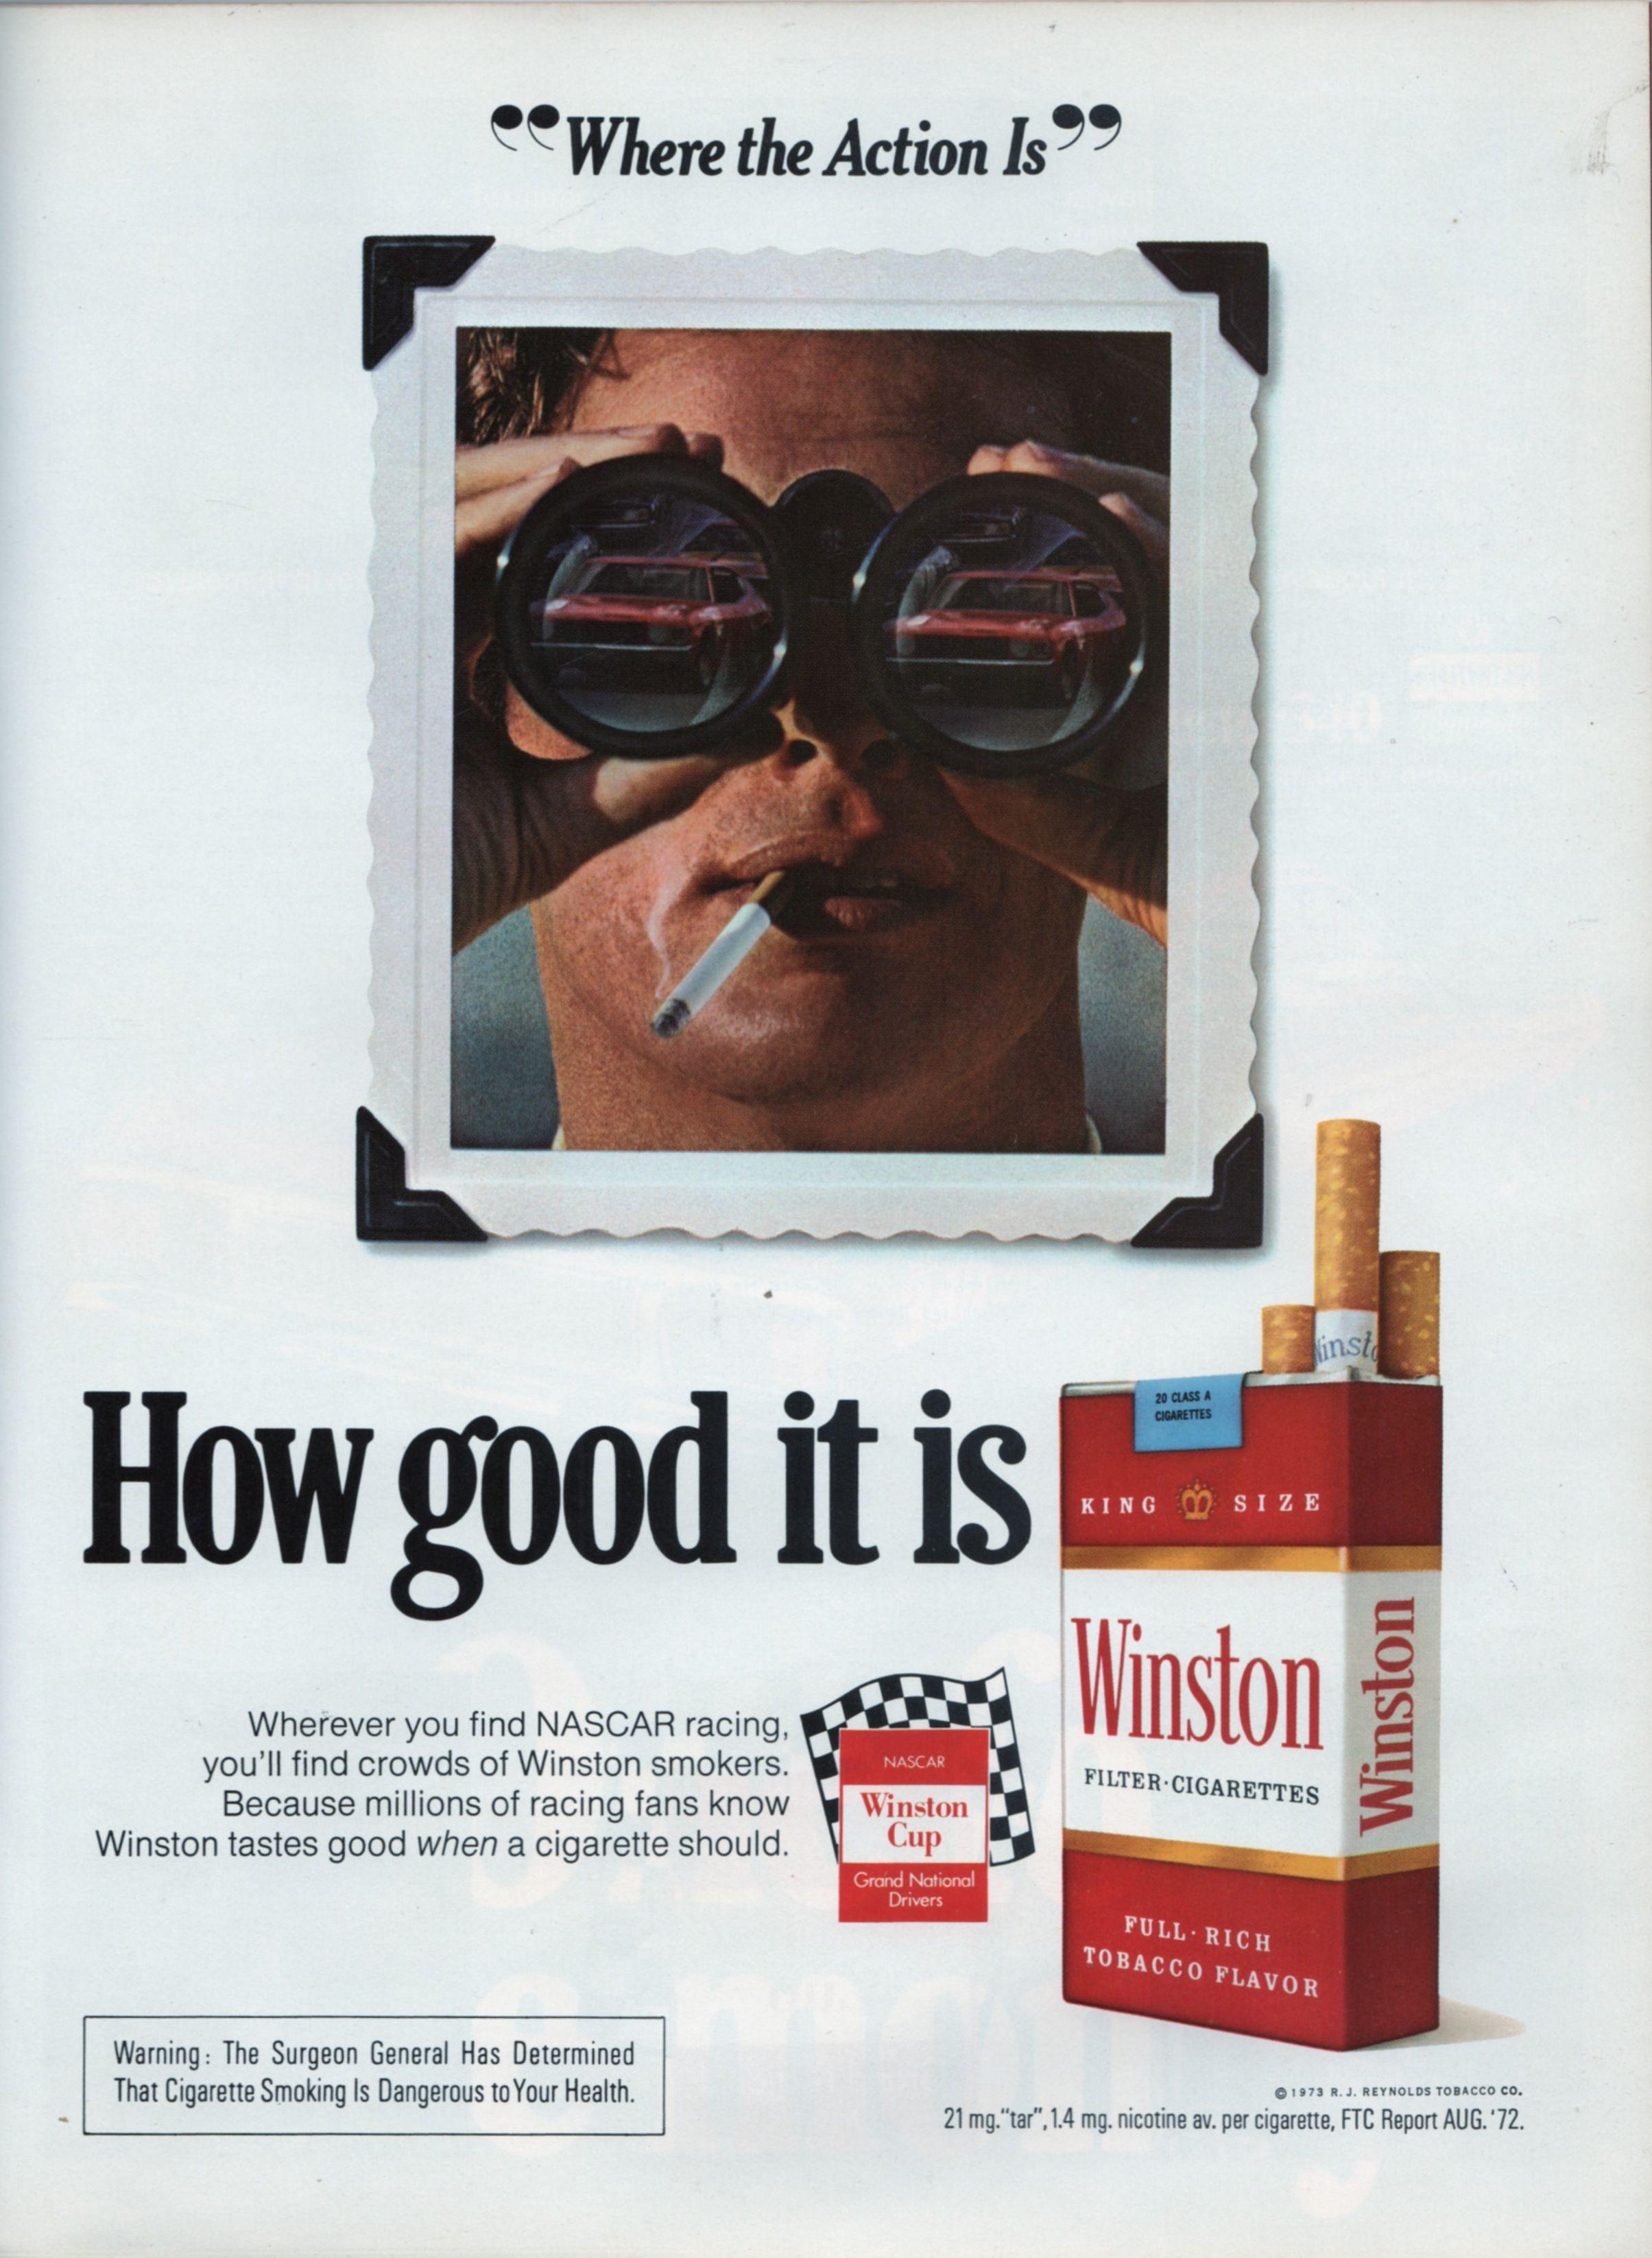 Winston Ad in 1973 Daytona 500 Program